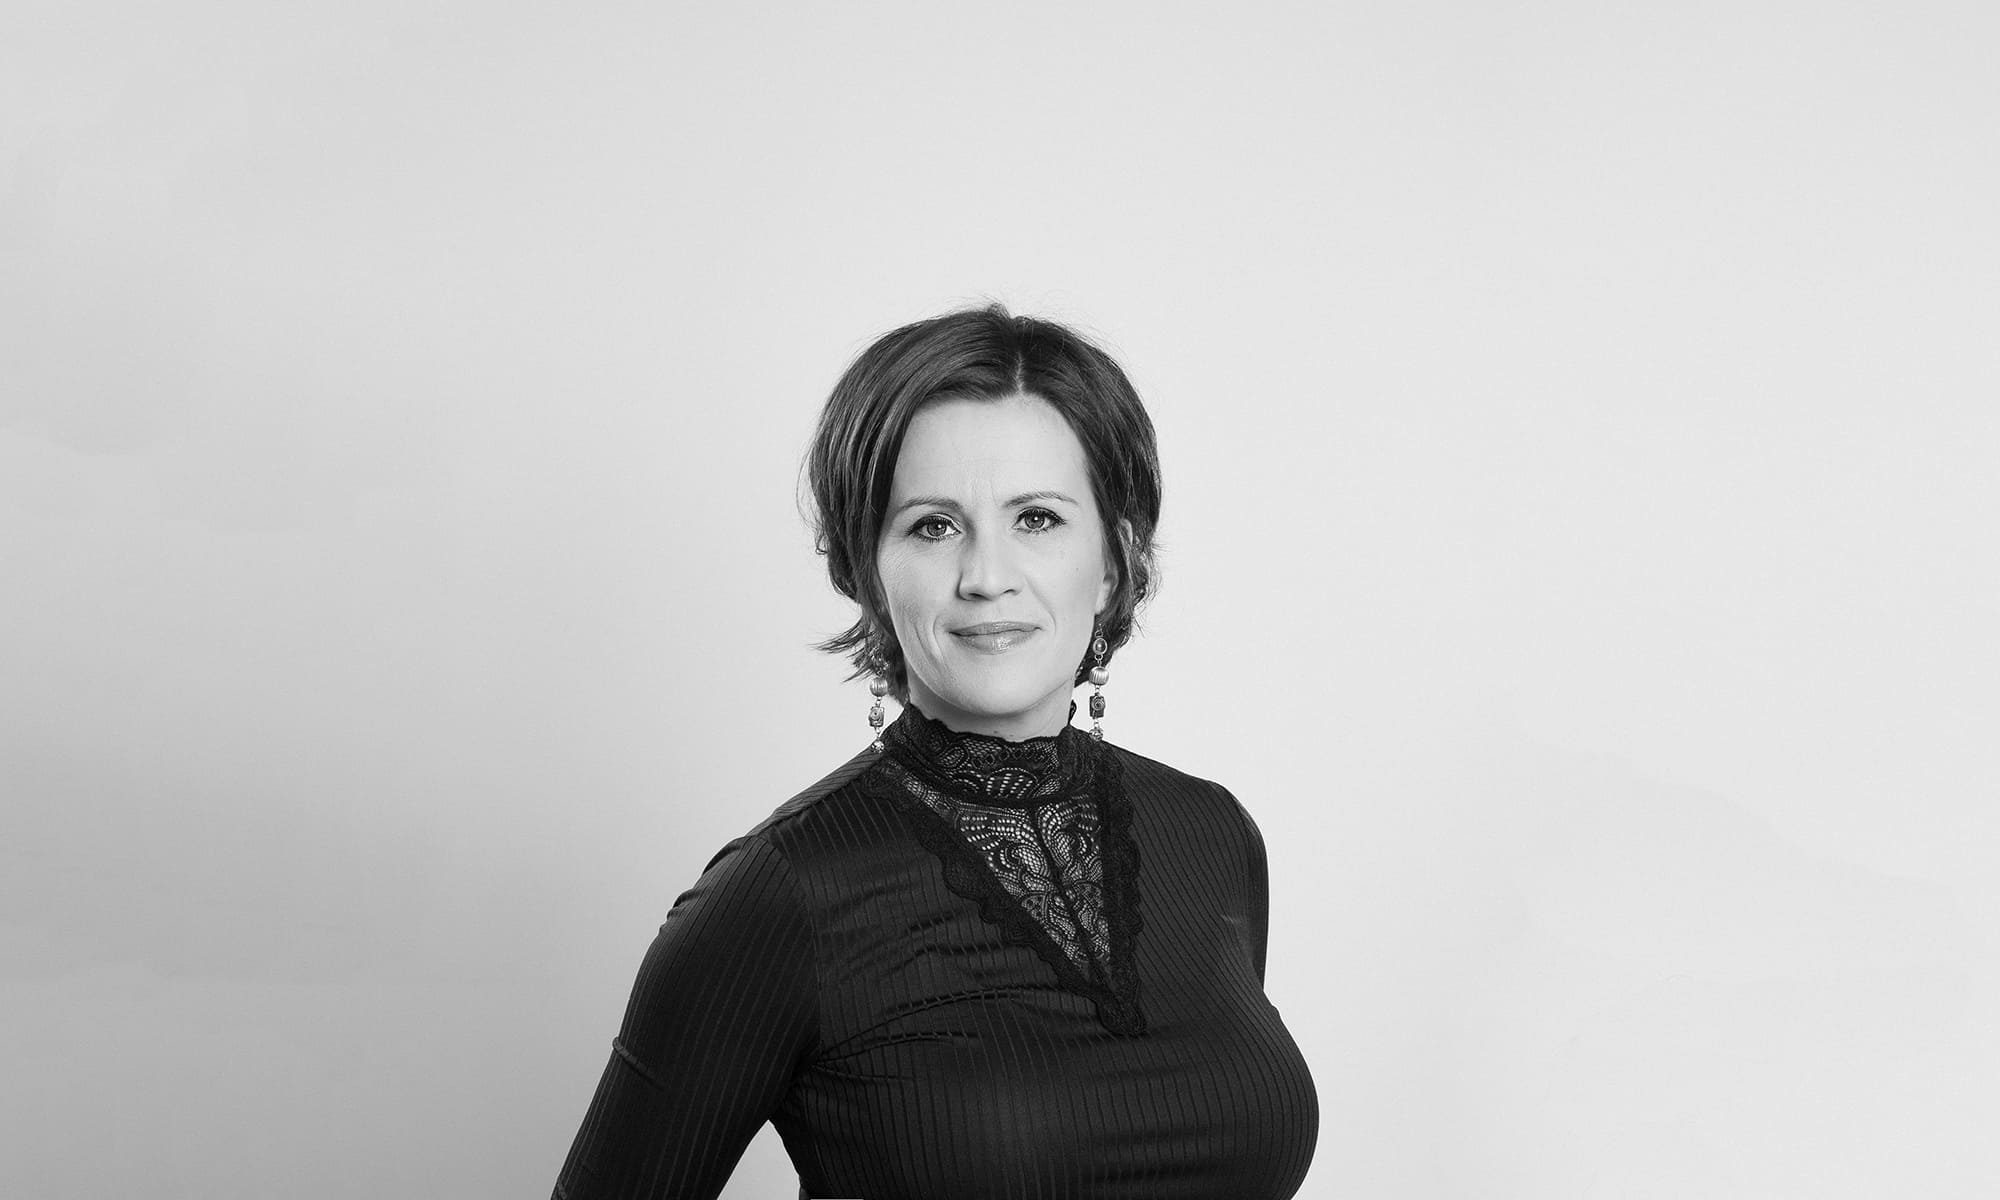 Heidi Storbacka